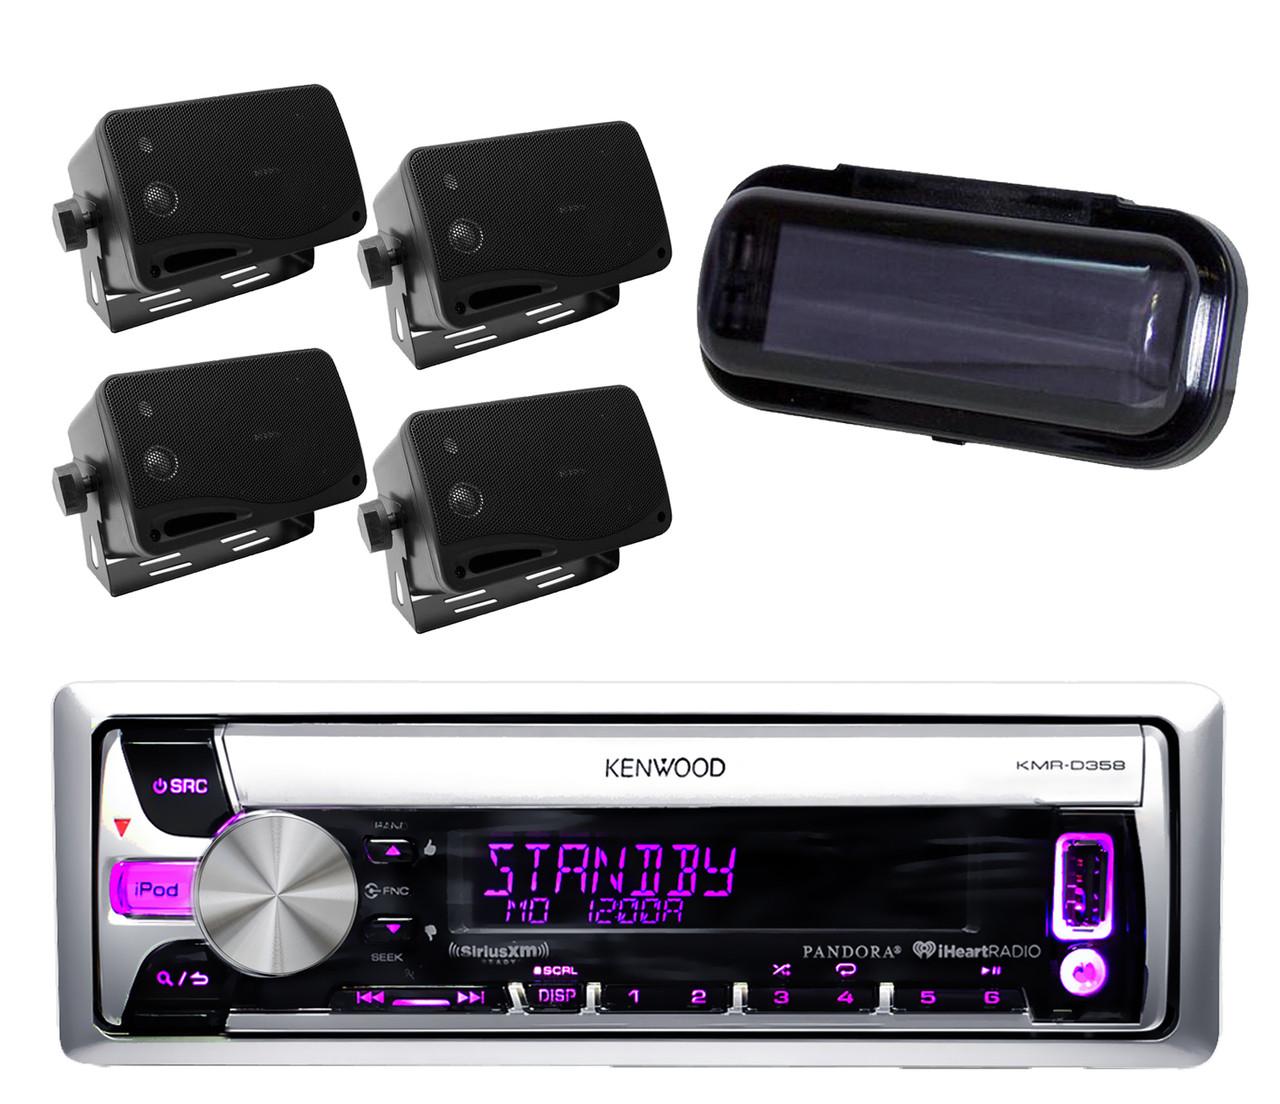 small resolution of kenwood new kmr d358 iphone ipod pandora radio player 4 black box speakers